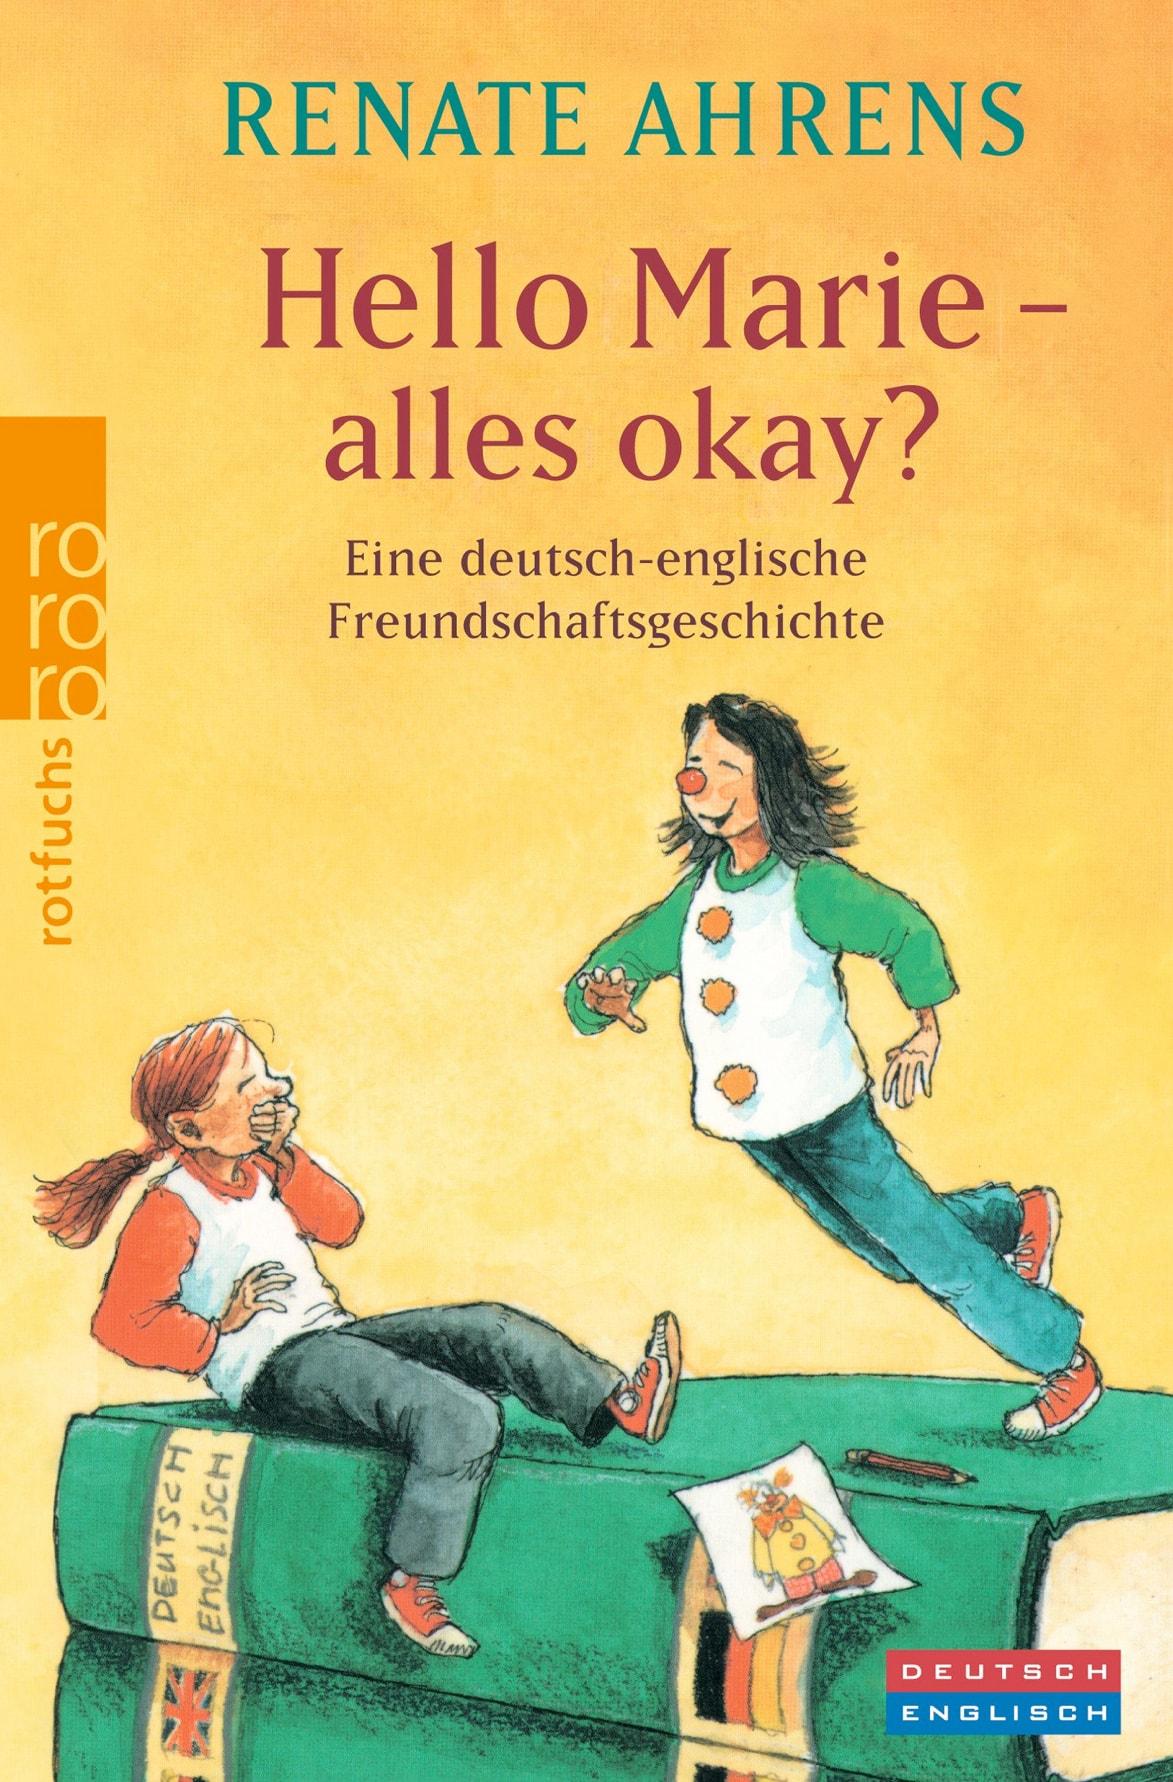 Renate Ahrens - Hello Marie - alles okay